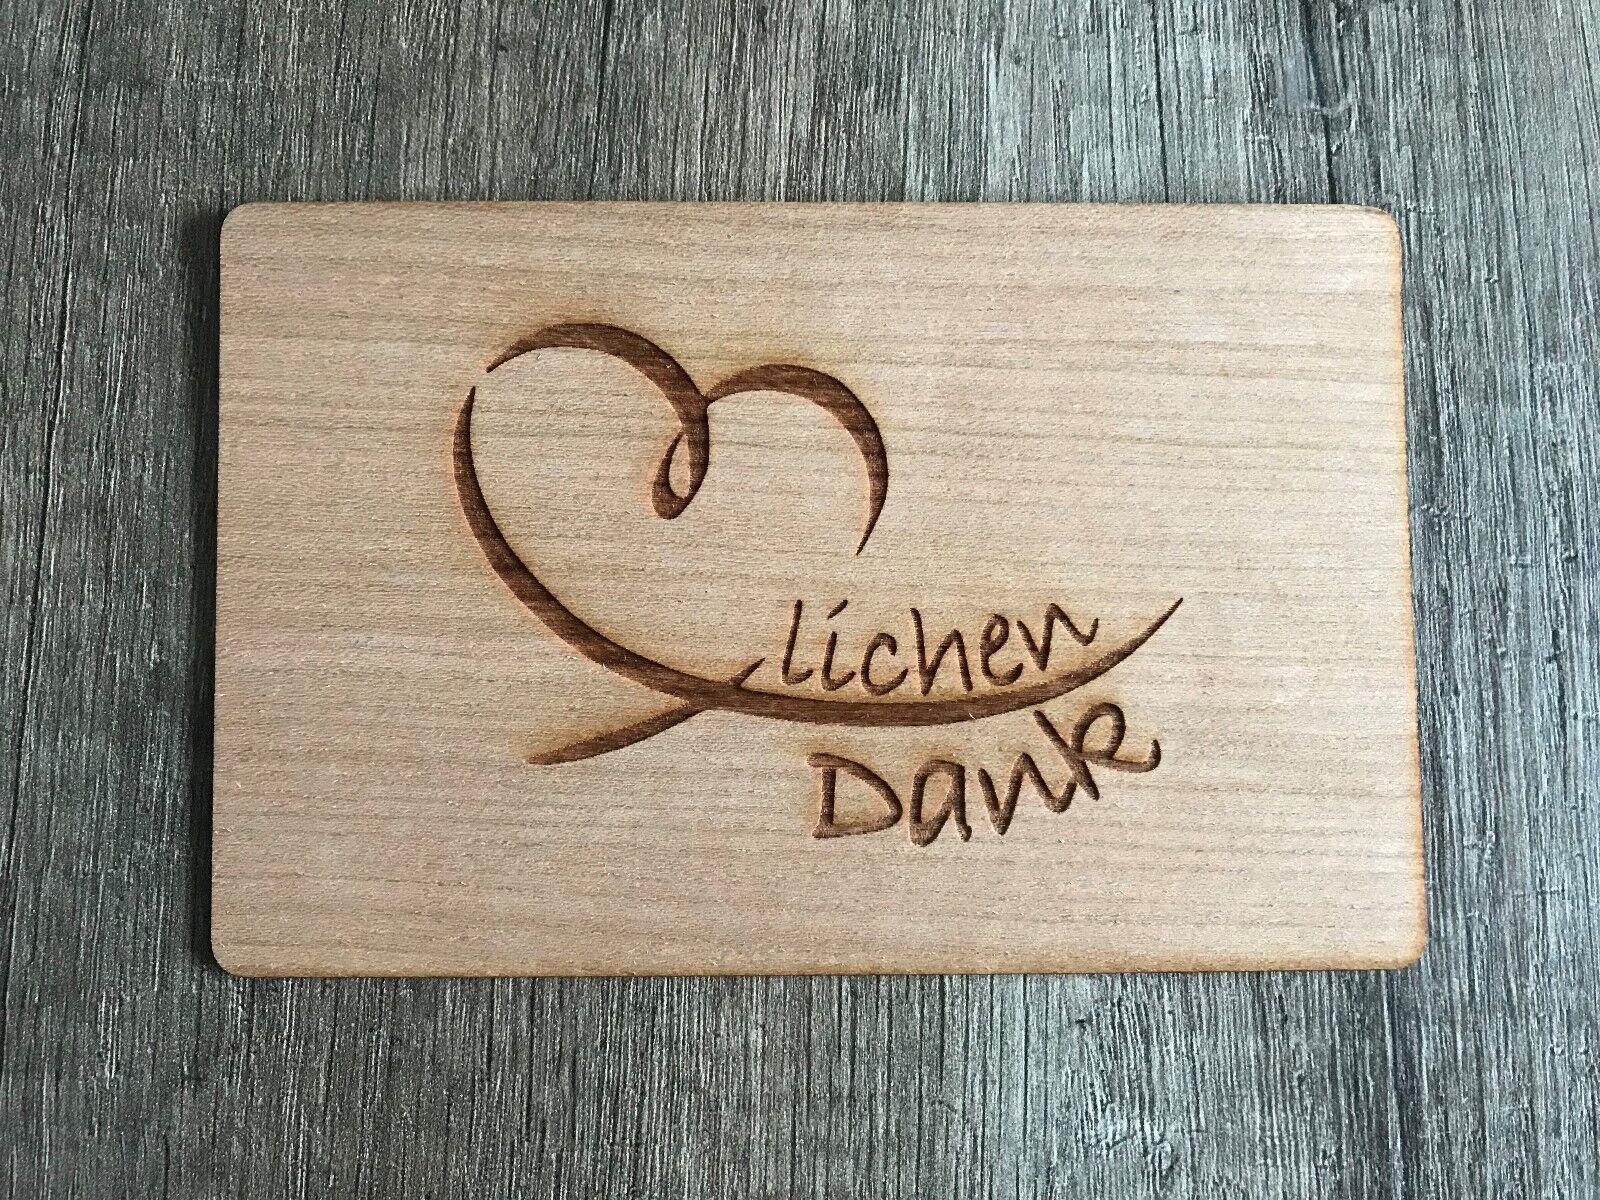 Grußkarte aus Holz Geschenk Karte Geschenkkarte Danke Herzlichen Dank Herz